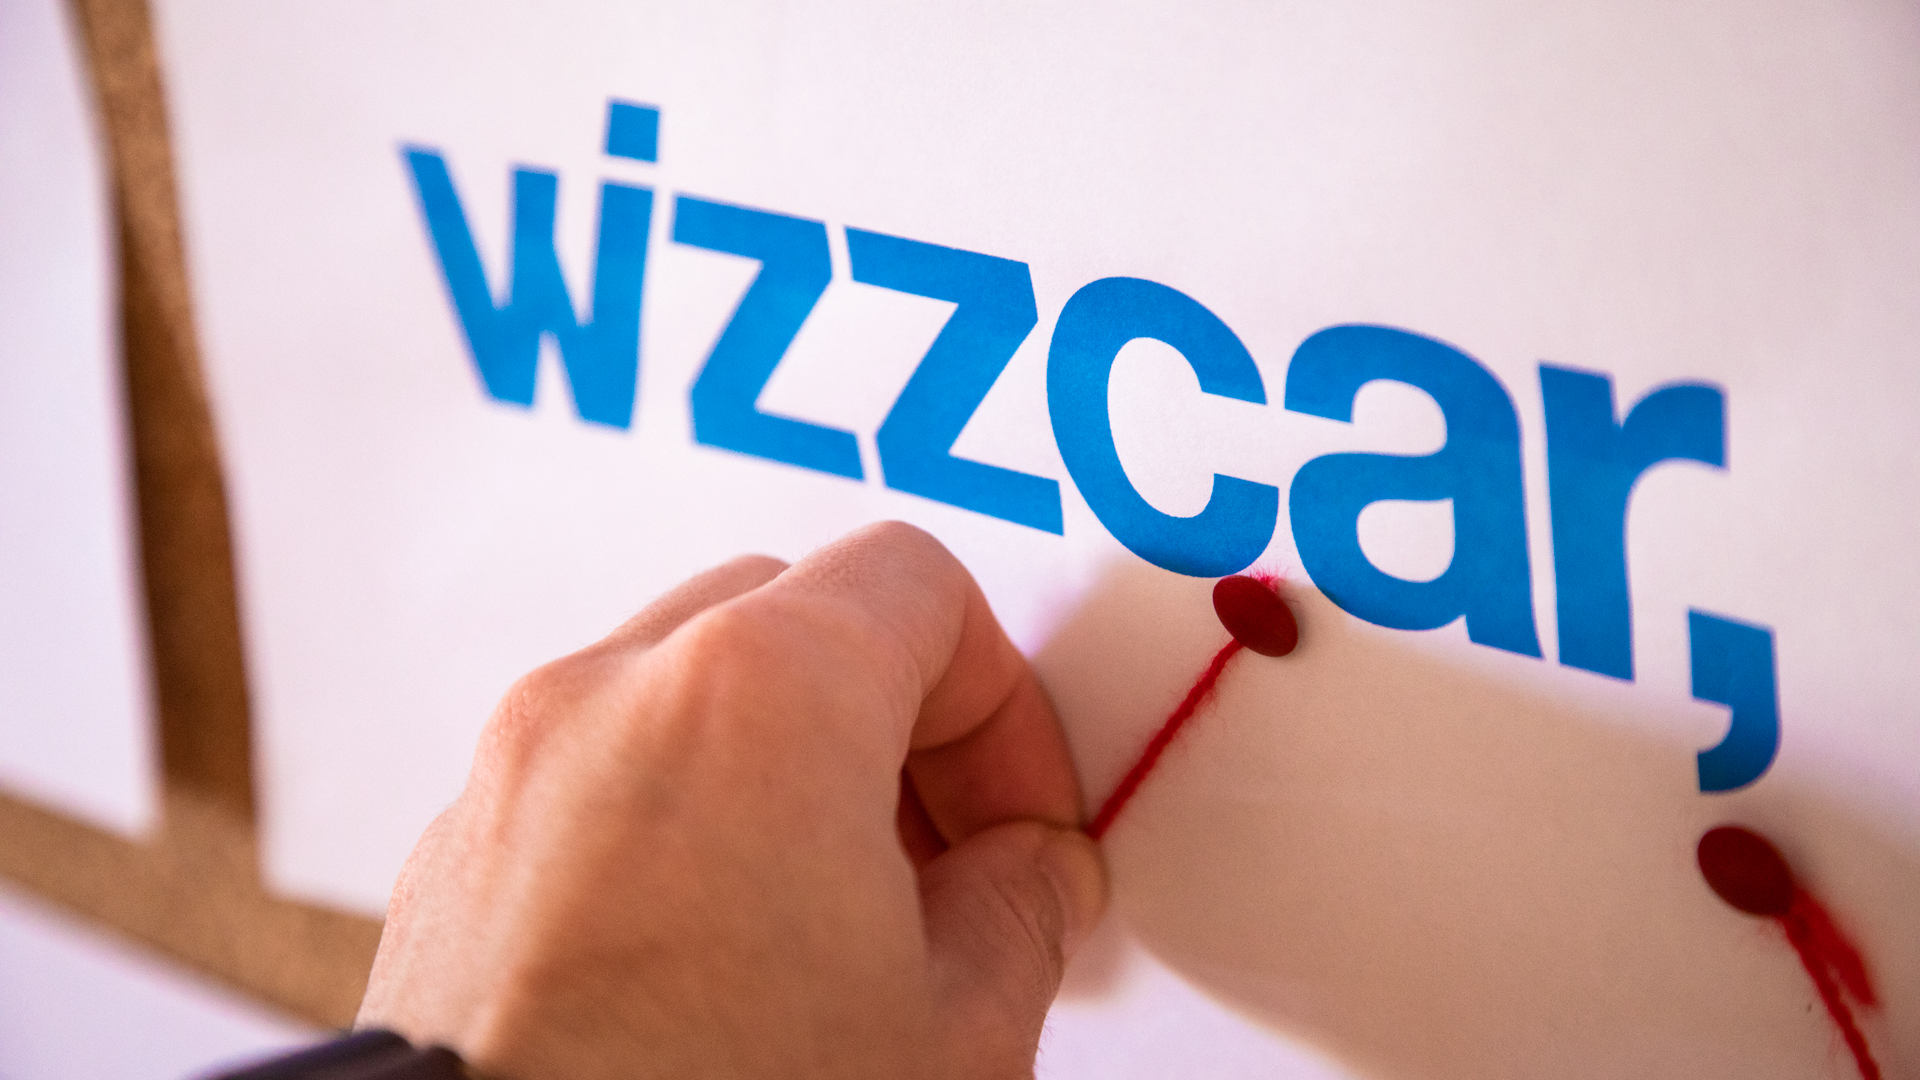 wizzcar-corcho